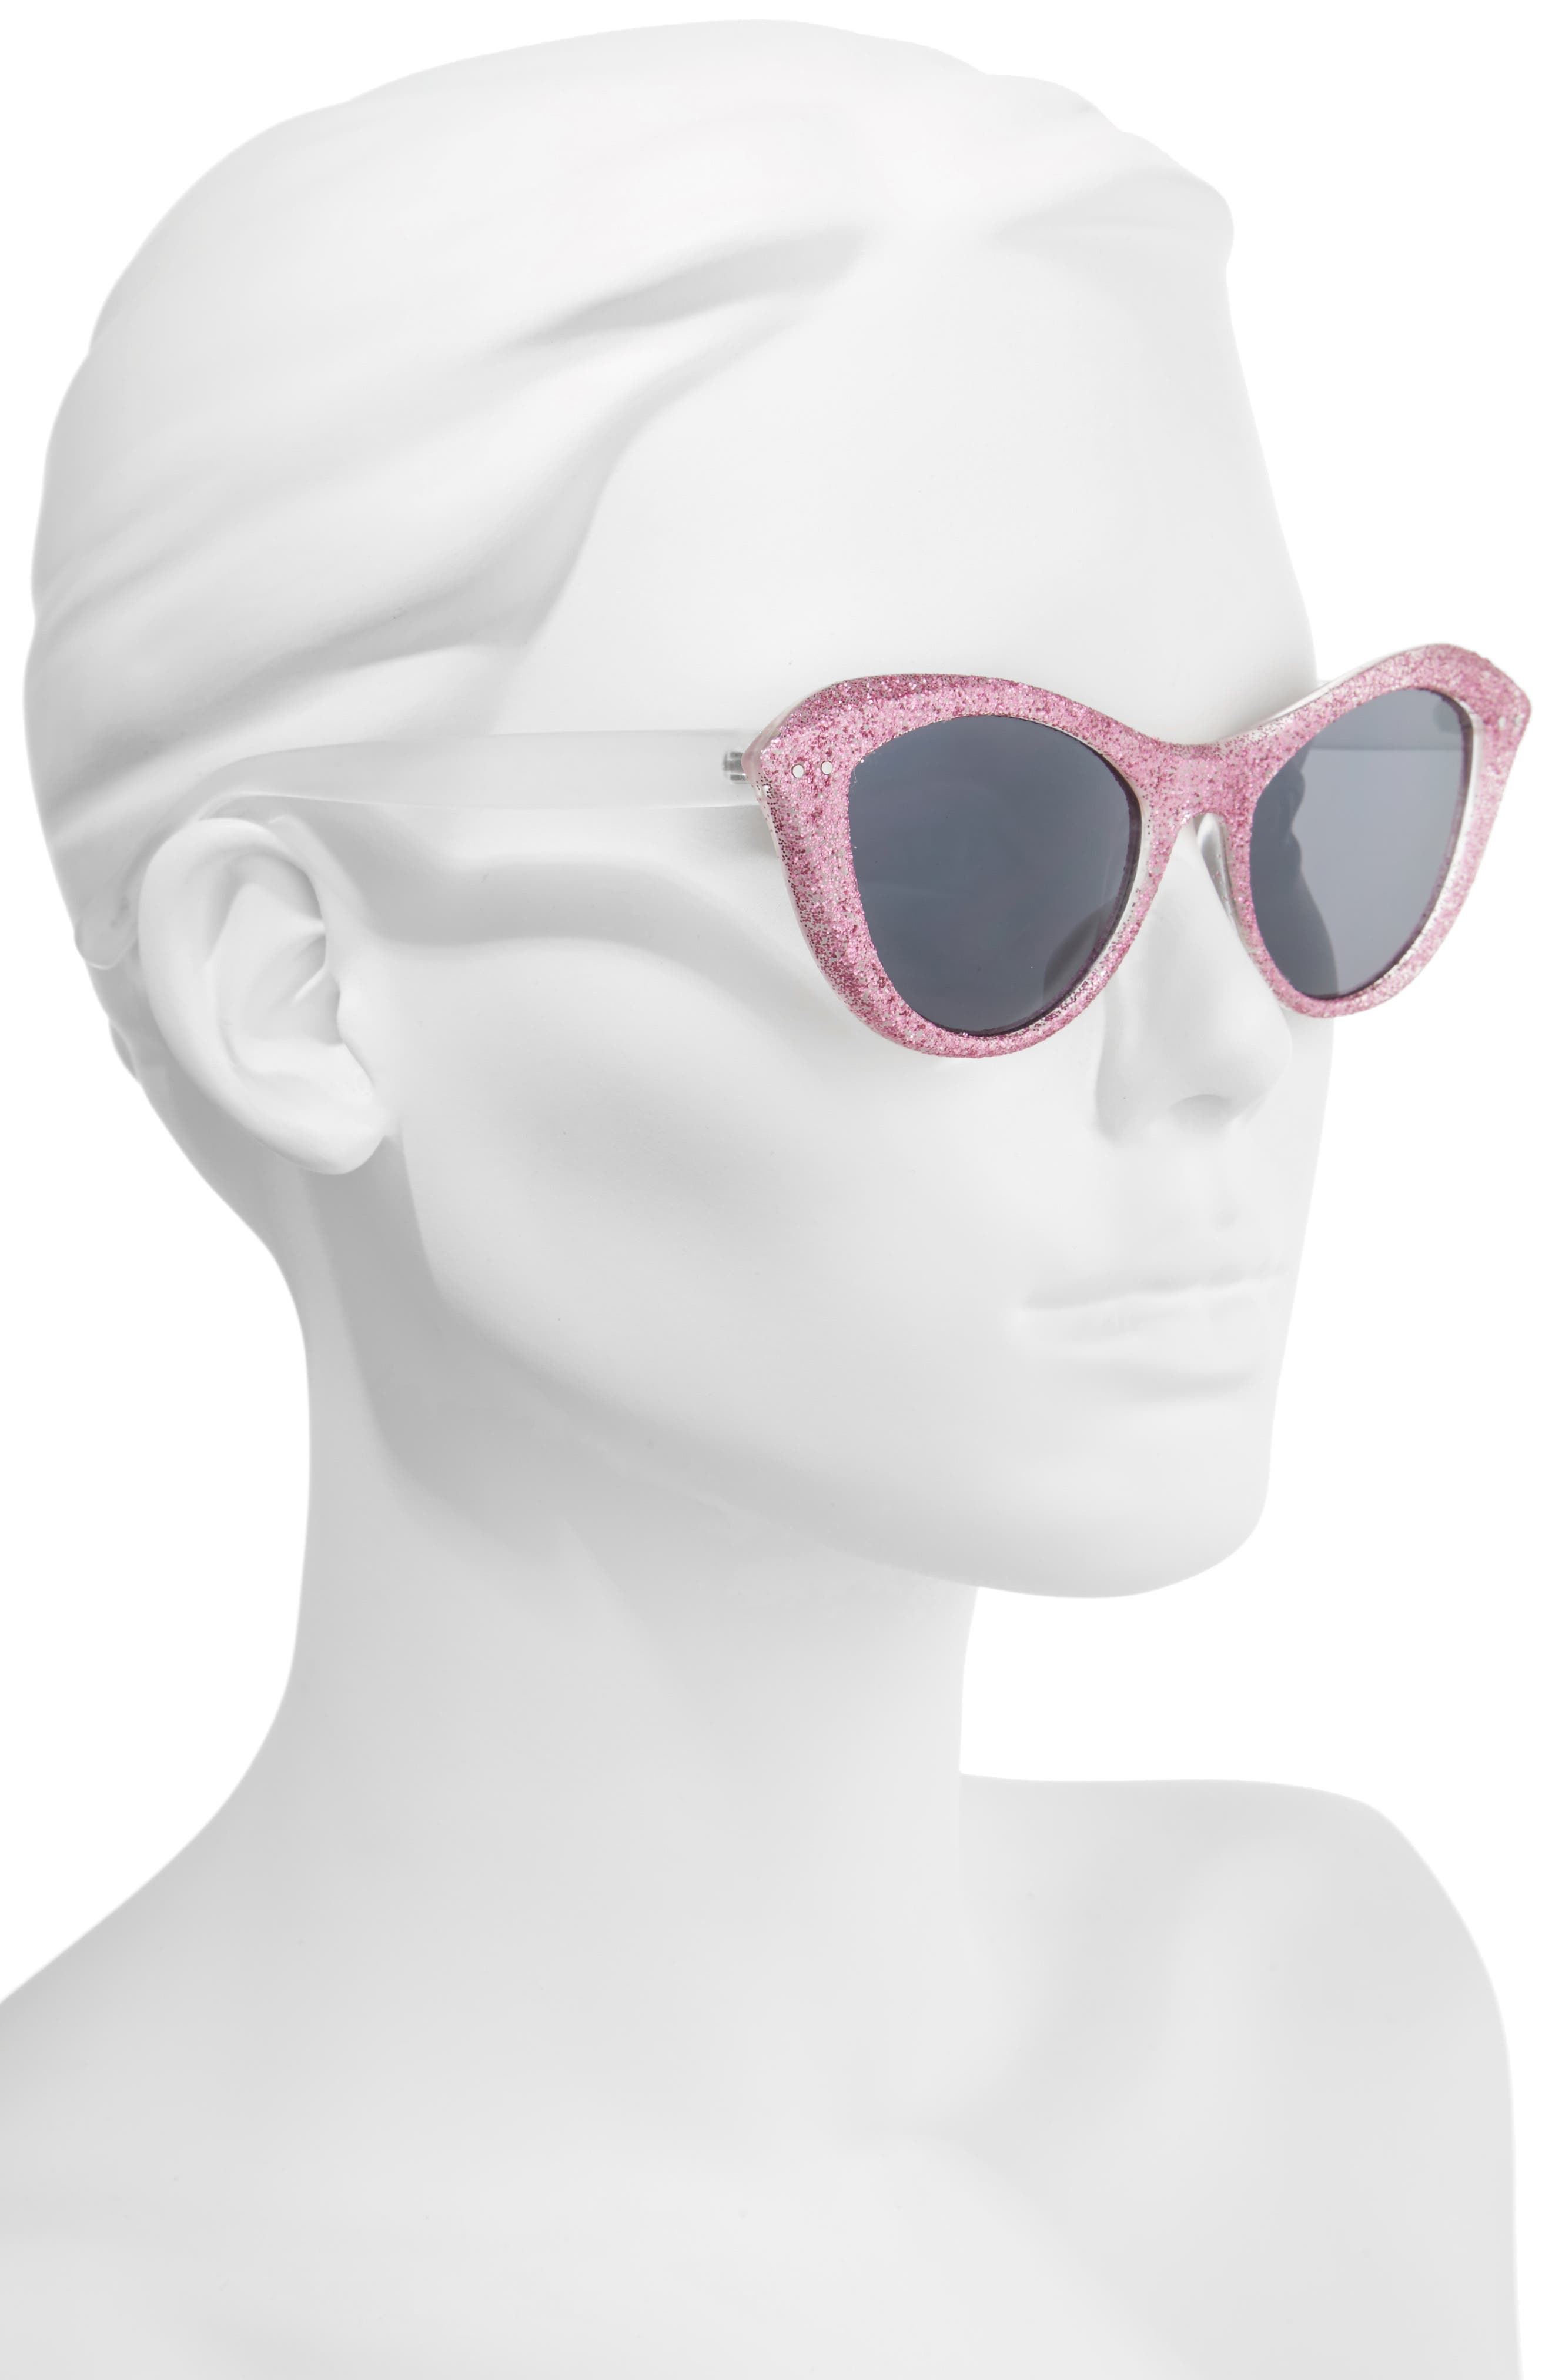 50mm Retro Cat Eye Sunglasses,                             Alternate thumbnail 2, color,                             Milky White/ Pink